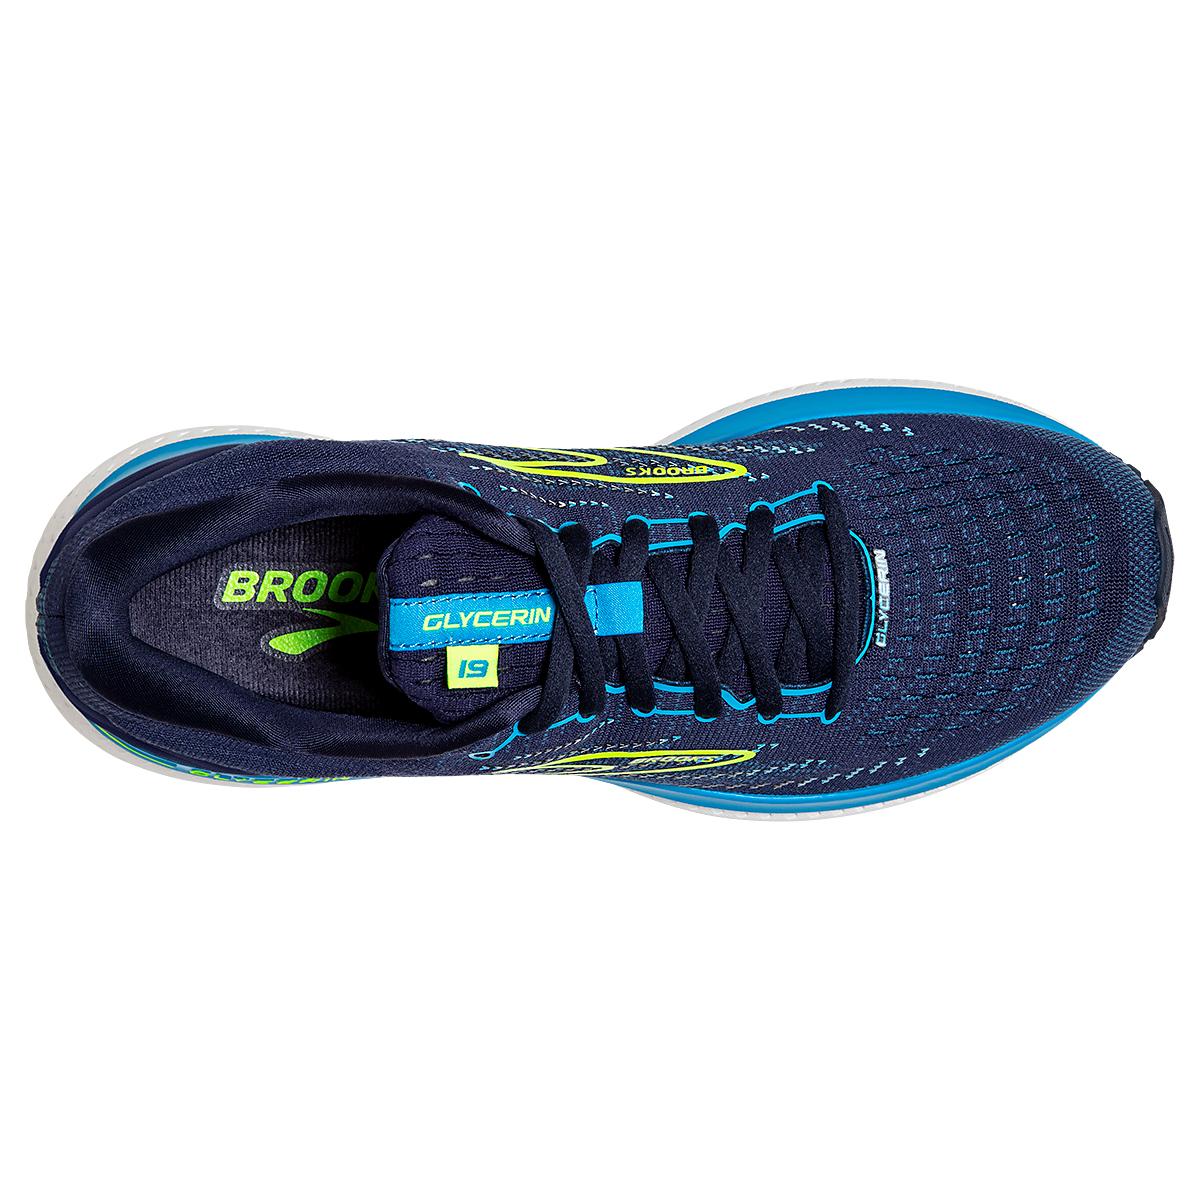 Men's Brooks Glycerin 19 Running Shoe - Color: Navy/Blue/Night - Size: 7 - Width: Regular, Navy/Blue/Night, large, image 2